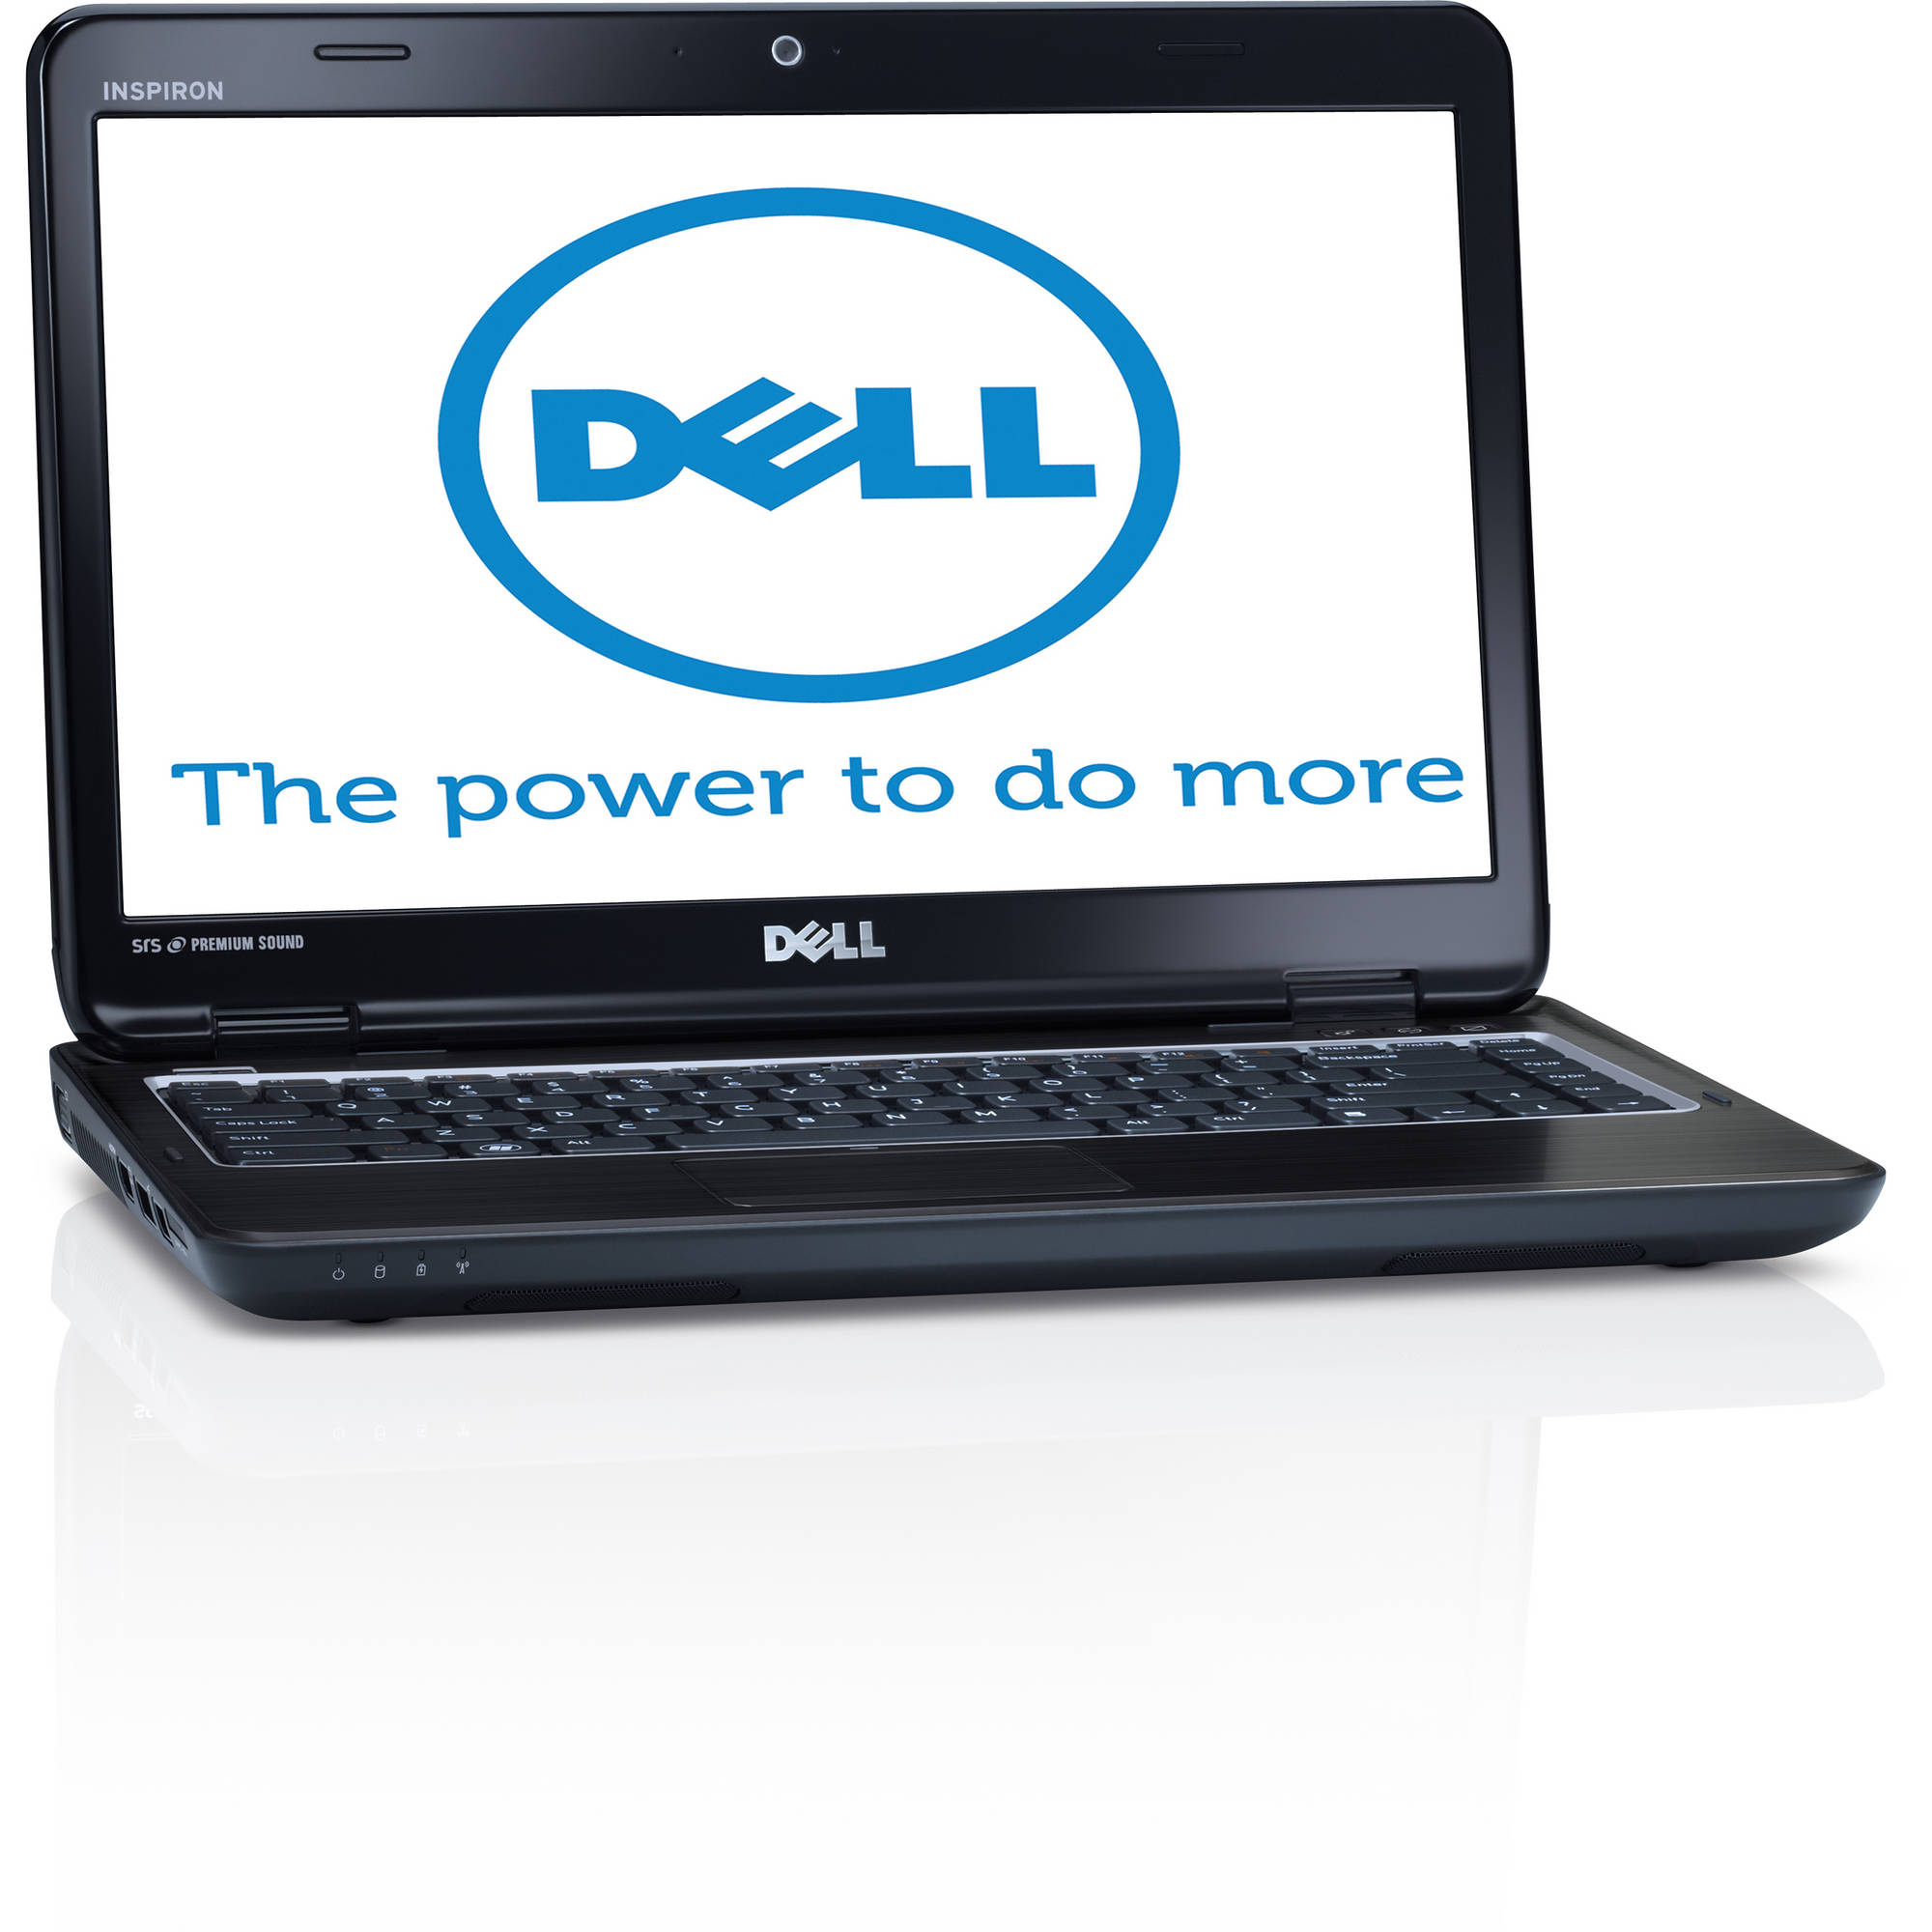 Dell Inspiron 14R i14RN-1818DBK 14